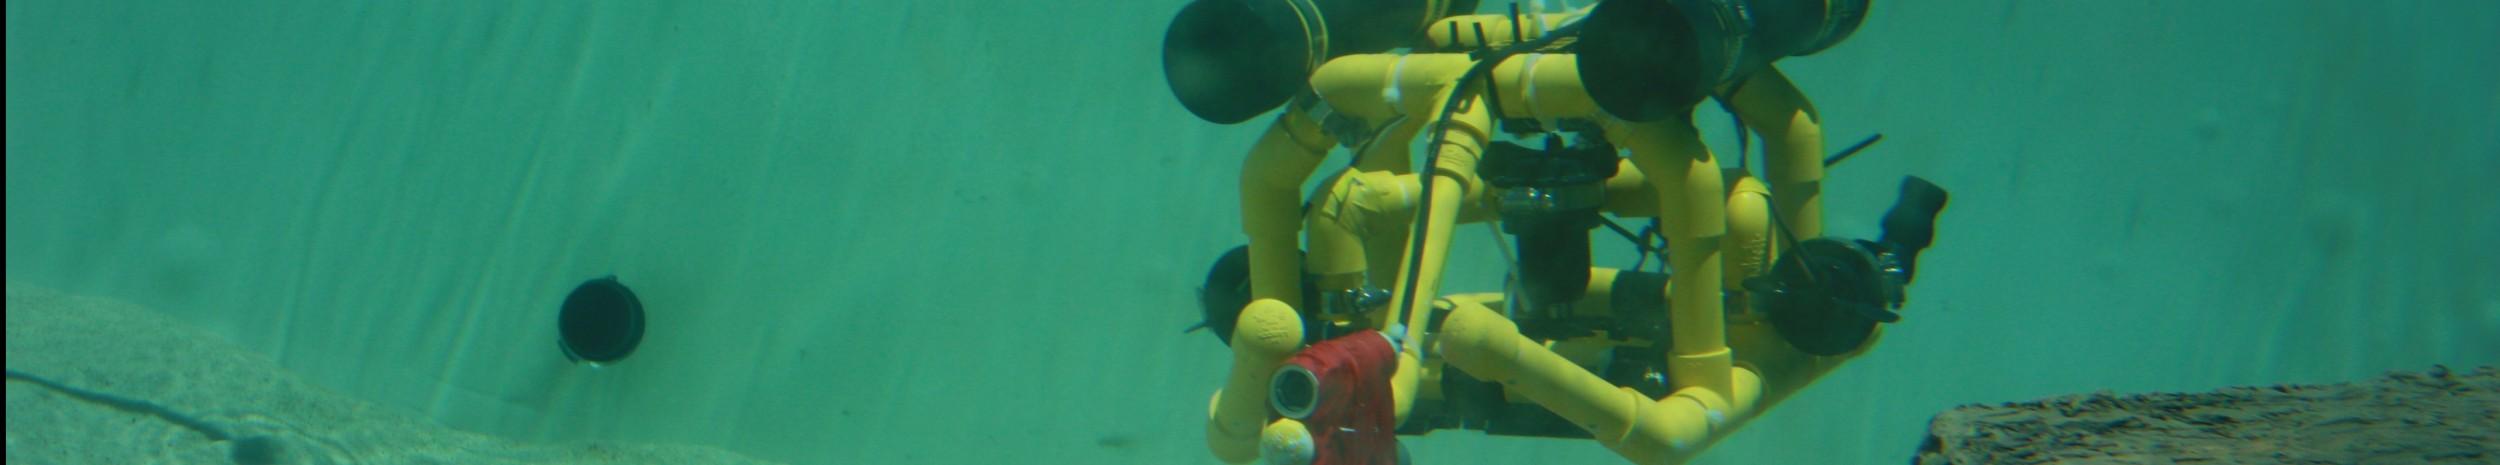 Seaperch robotics program at Westlake